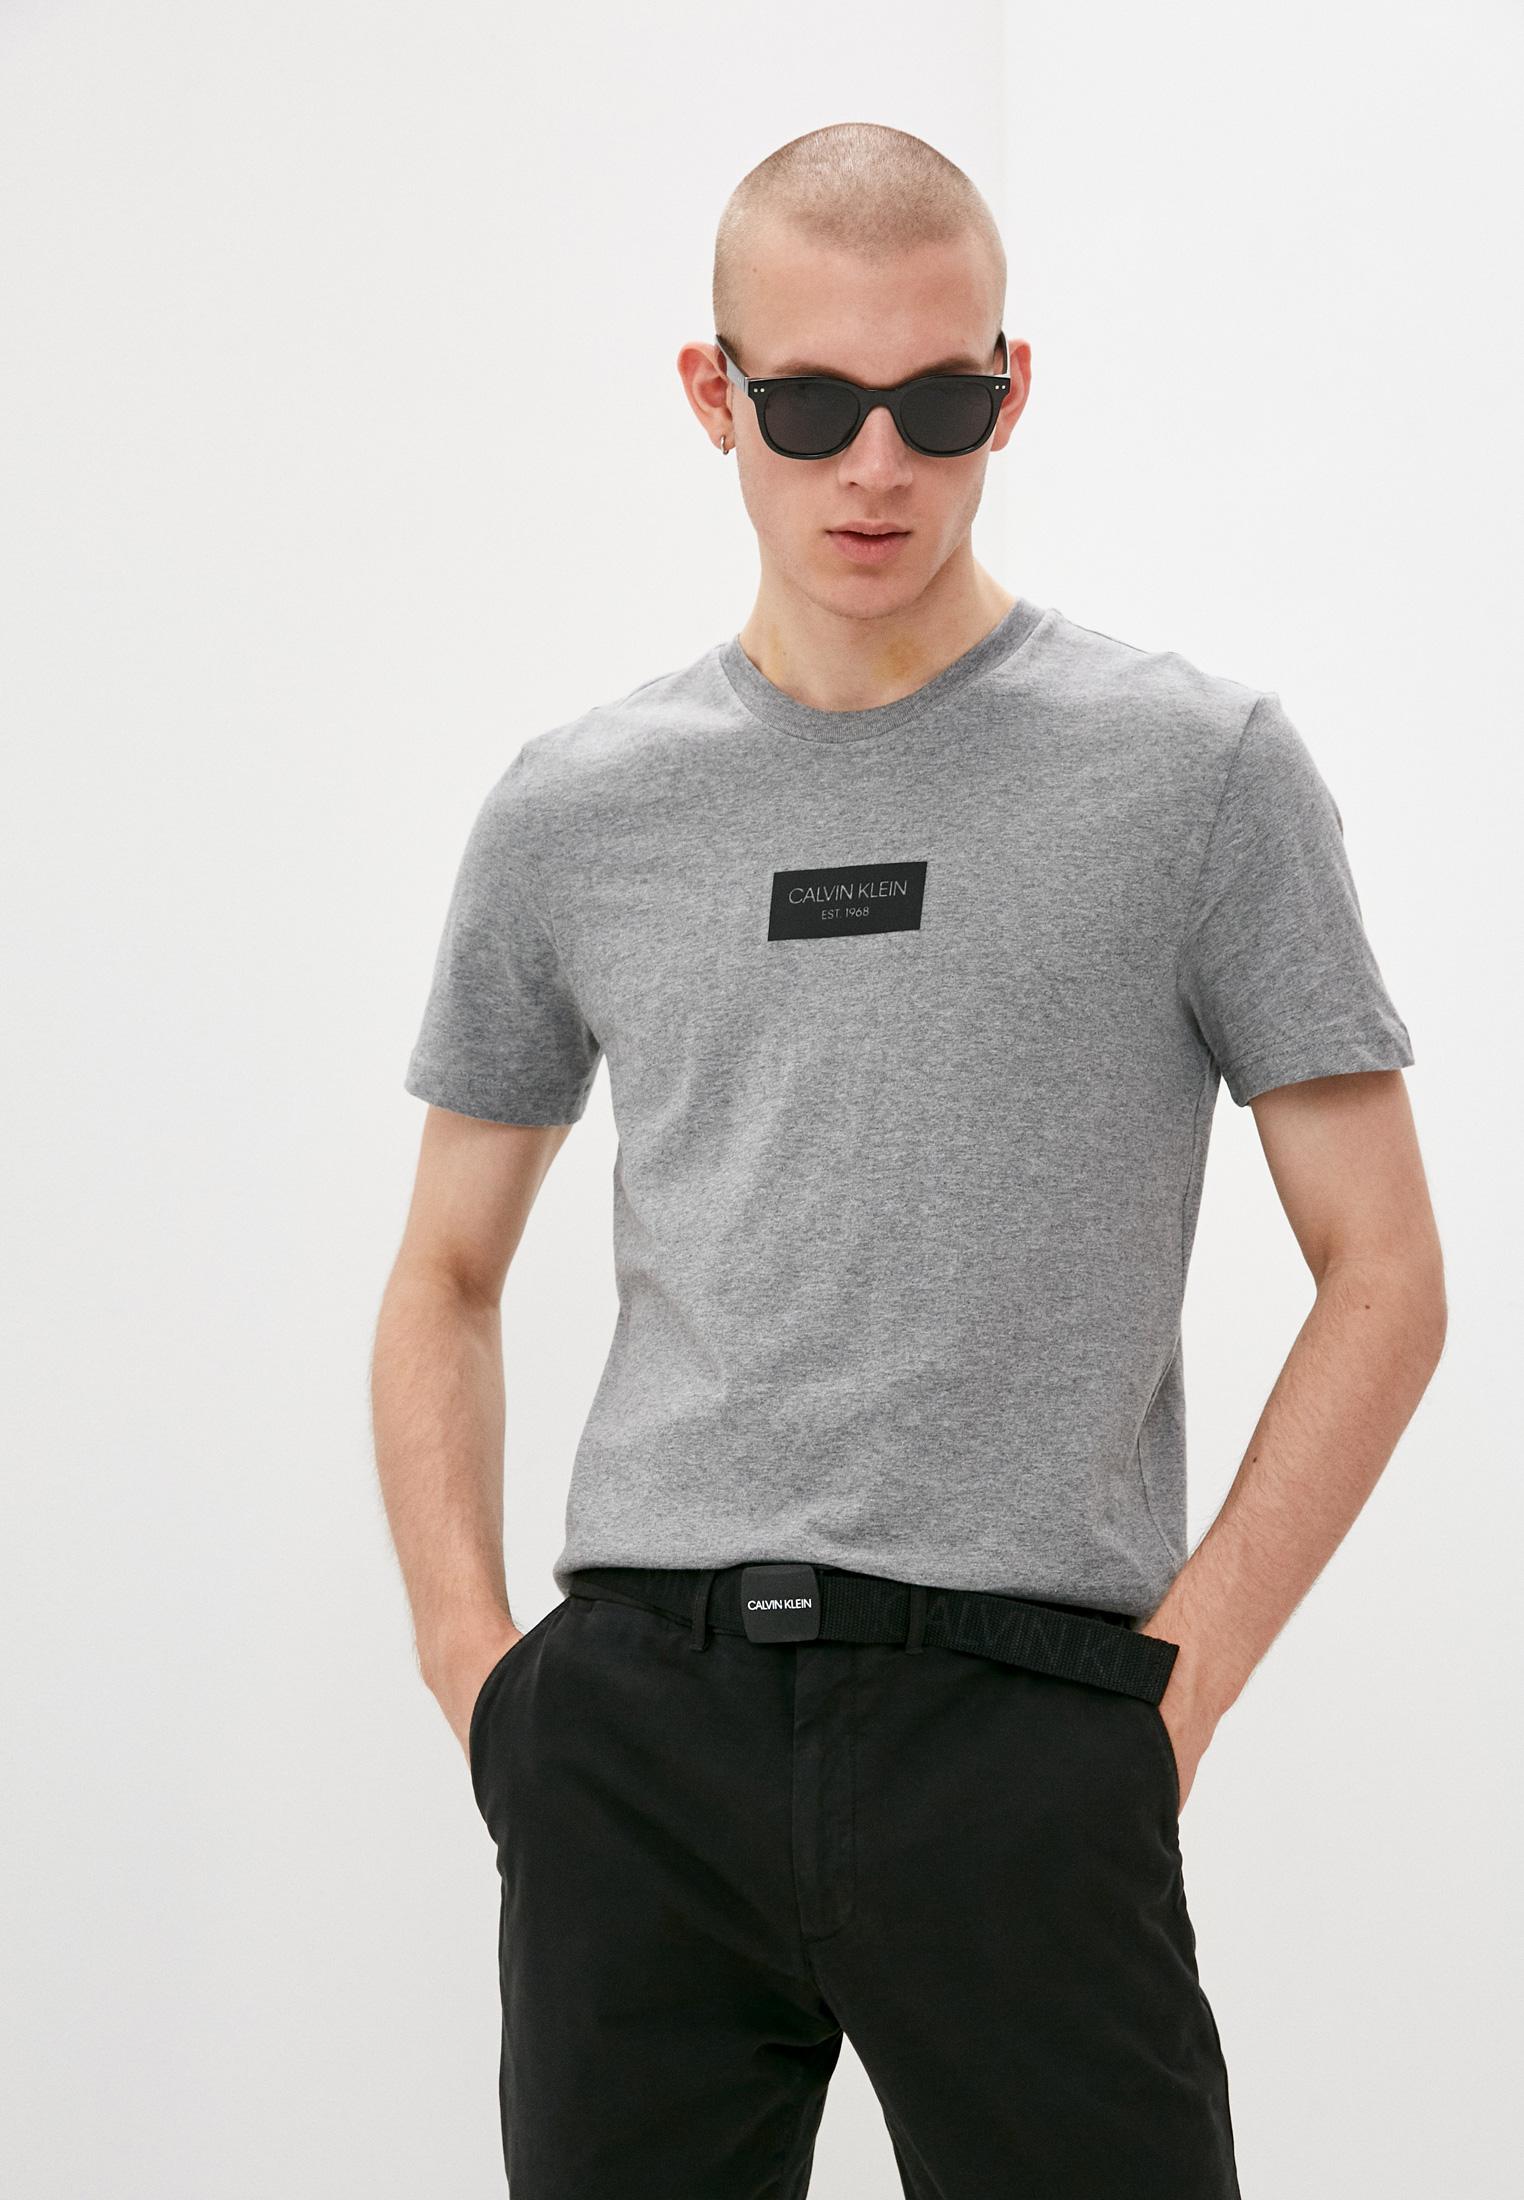 Мужская футболка Calvin Klein (Кельвин Кляйн) K10K106484